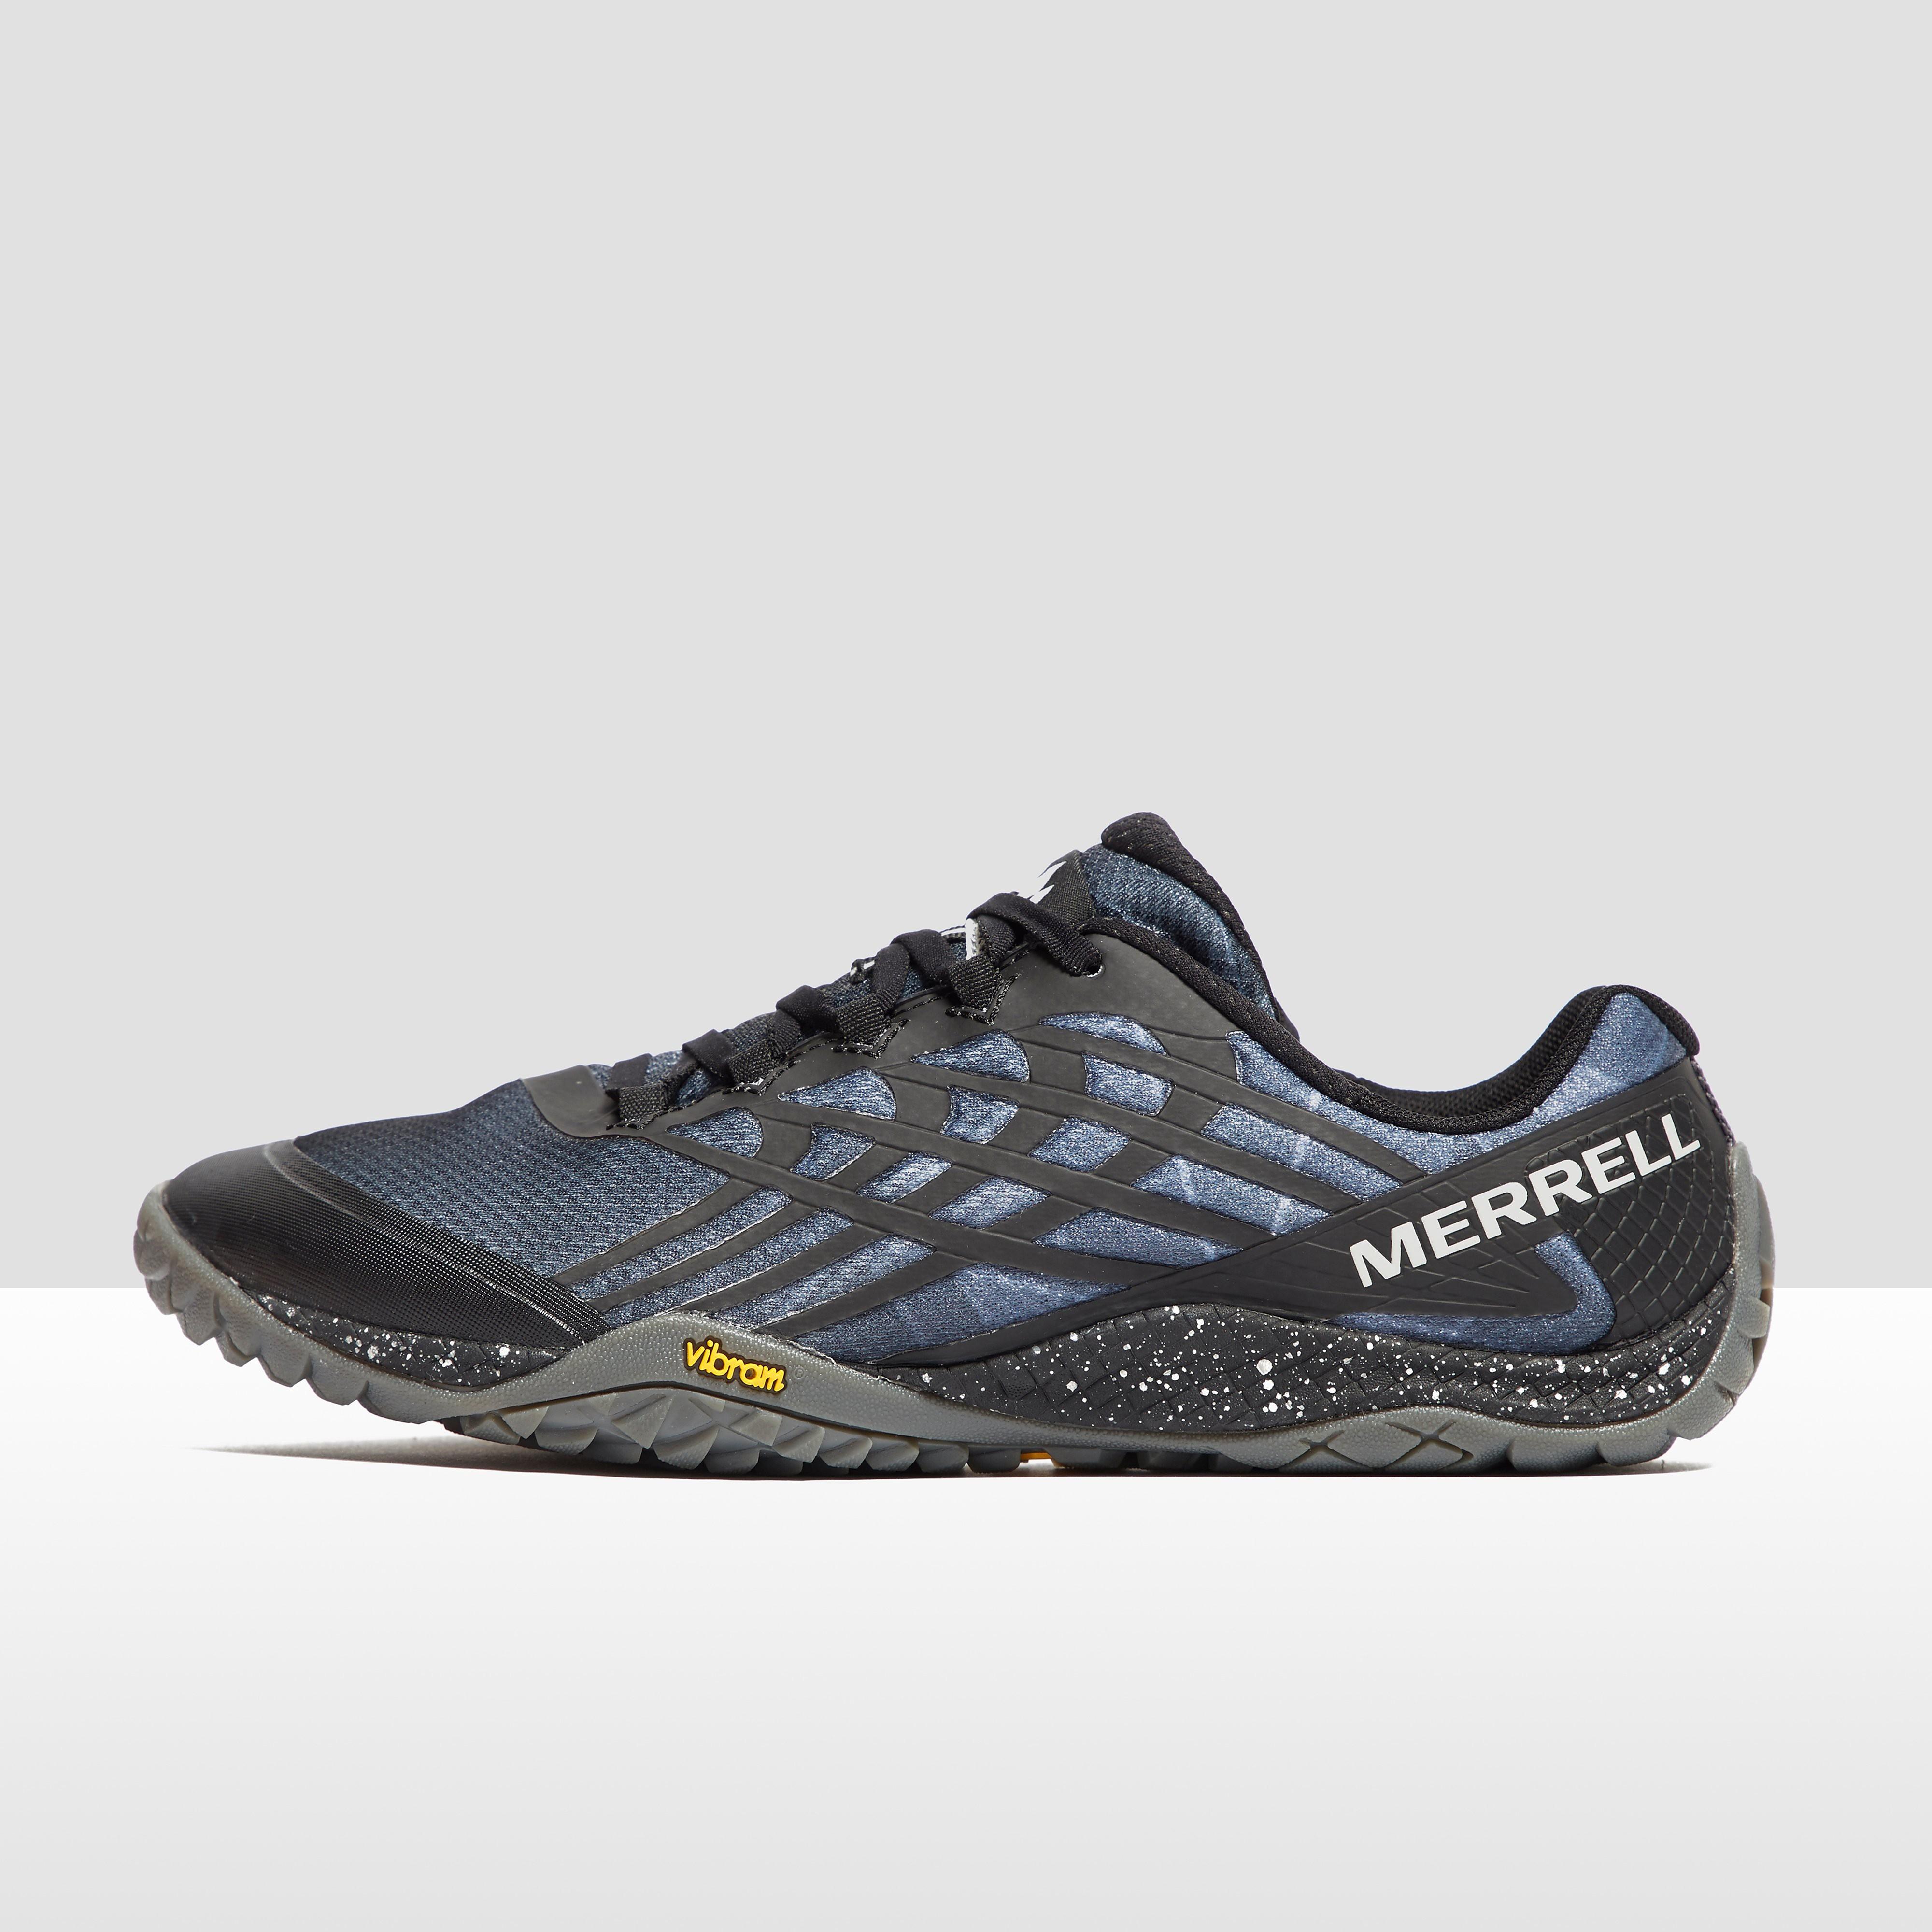 Merrell Trail Glove 4 Men's Trial Running Shoes